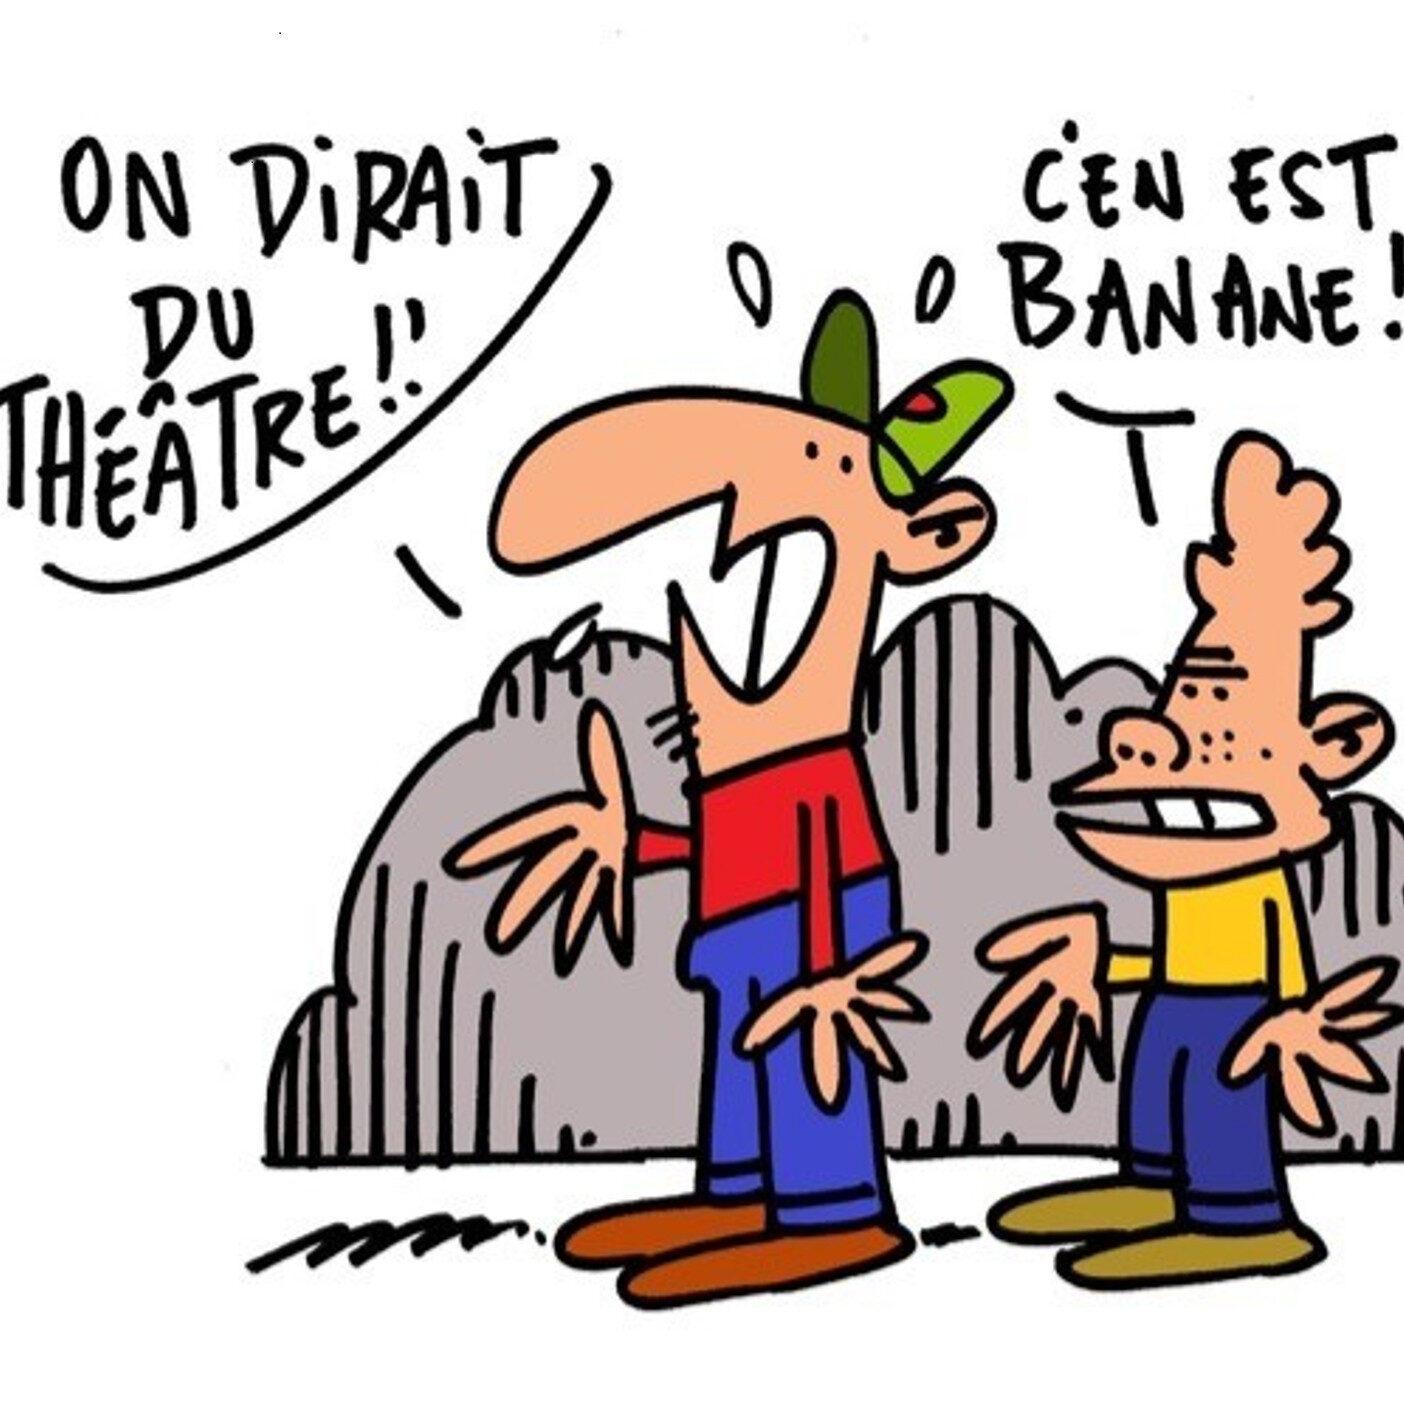 on-dirait-du-theatre.jpg.9b03b0f314cc046a9e93de7a216fd118.jpg